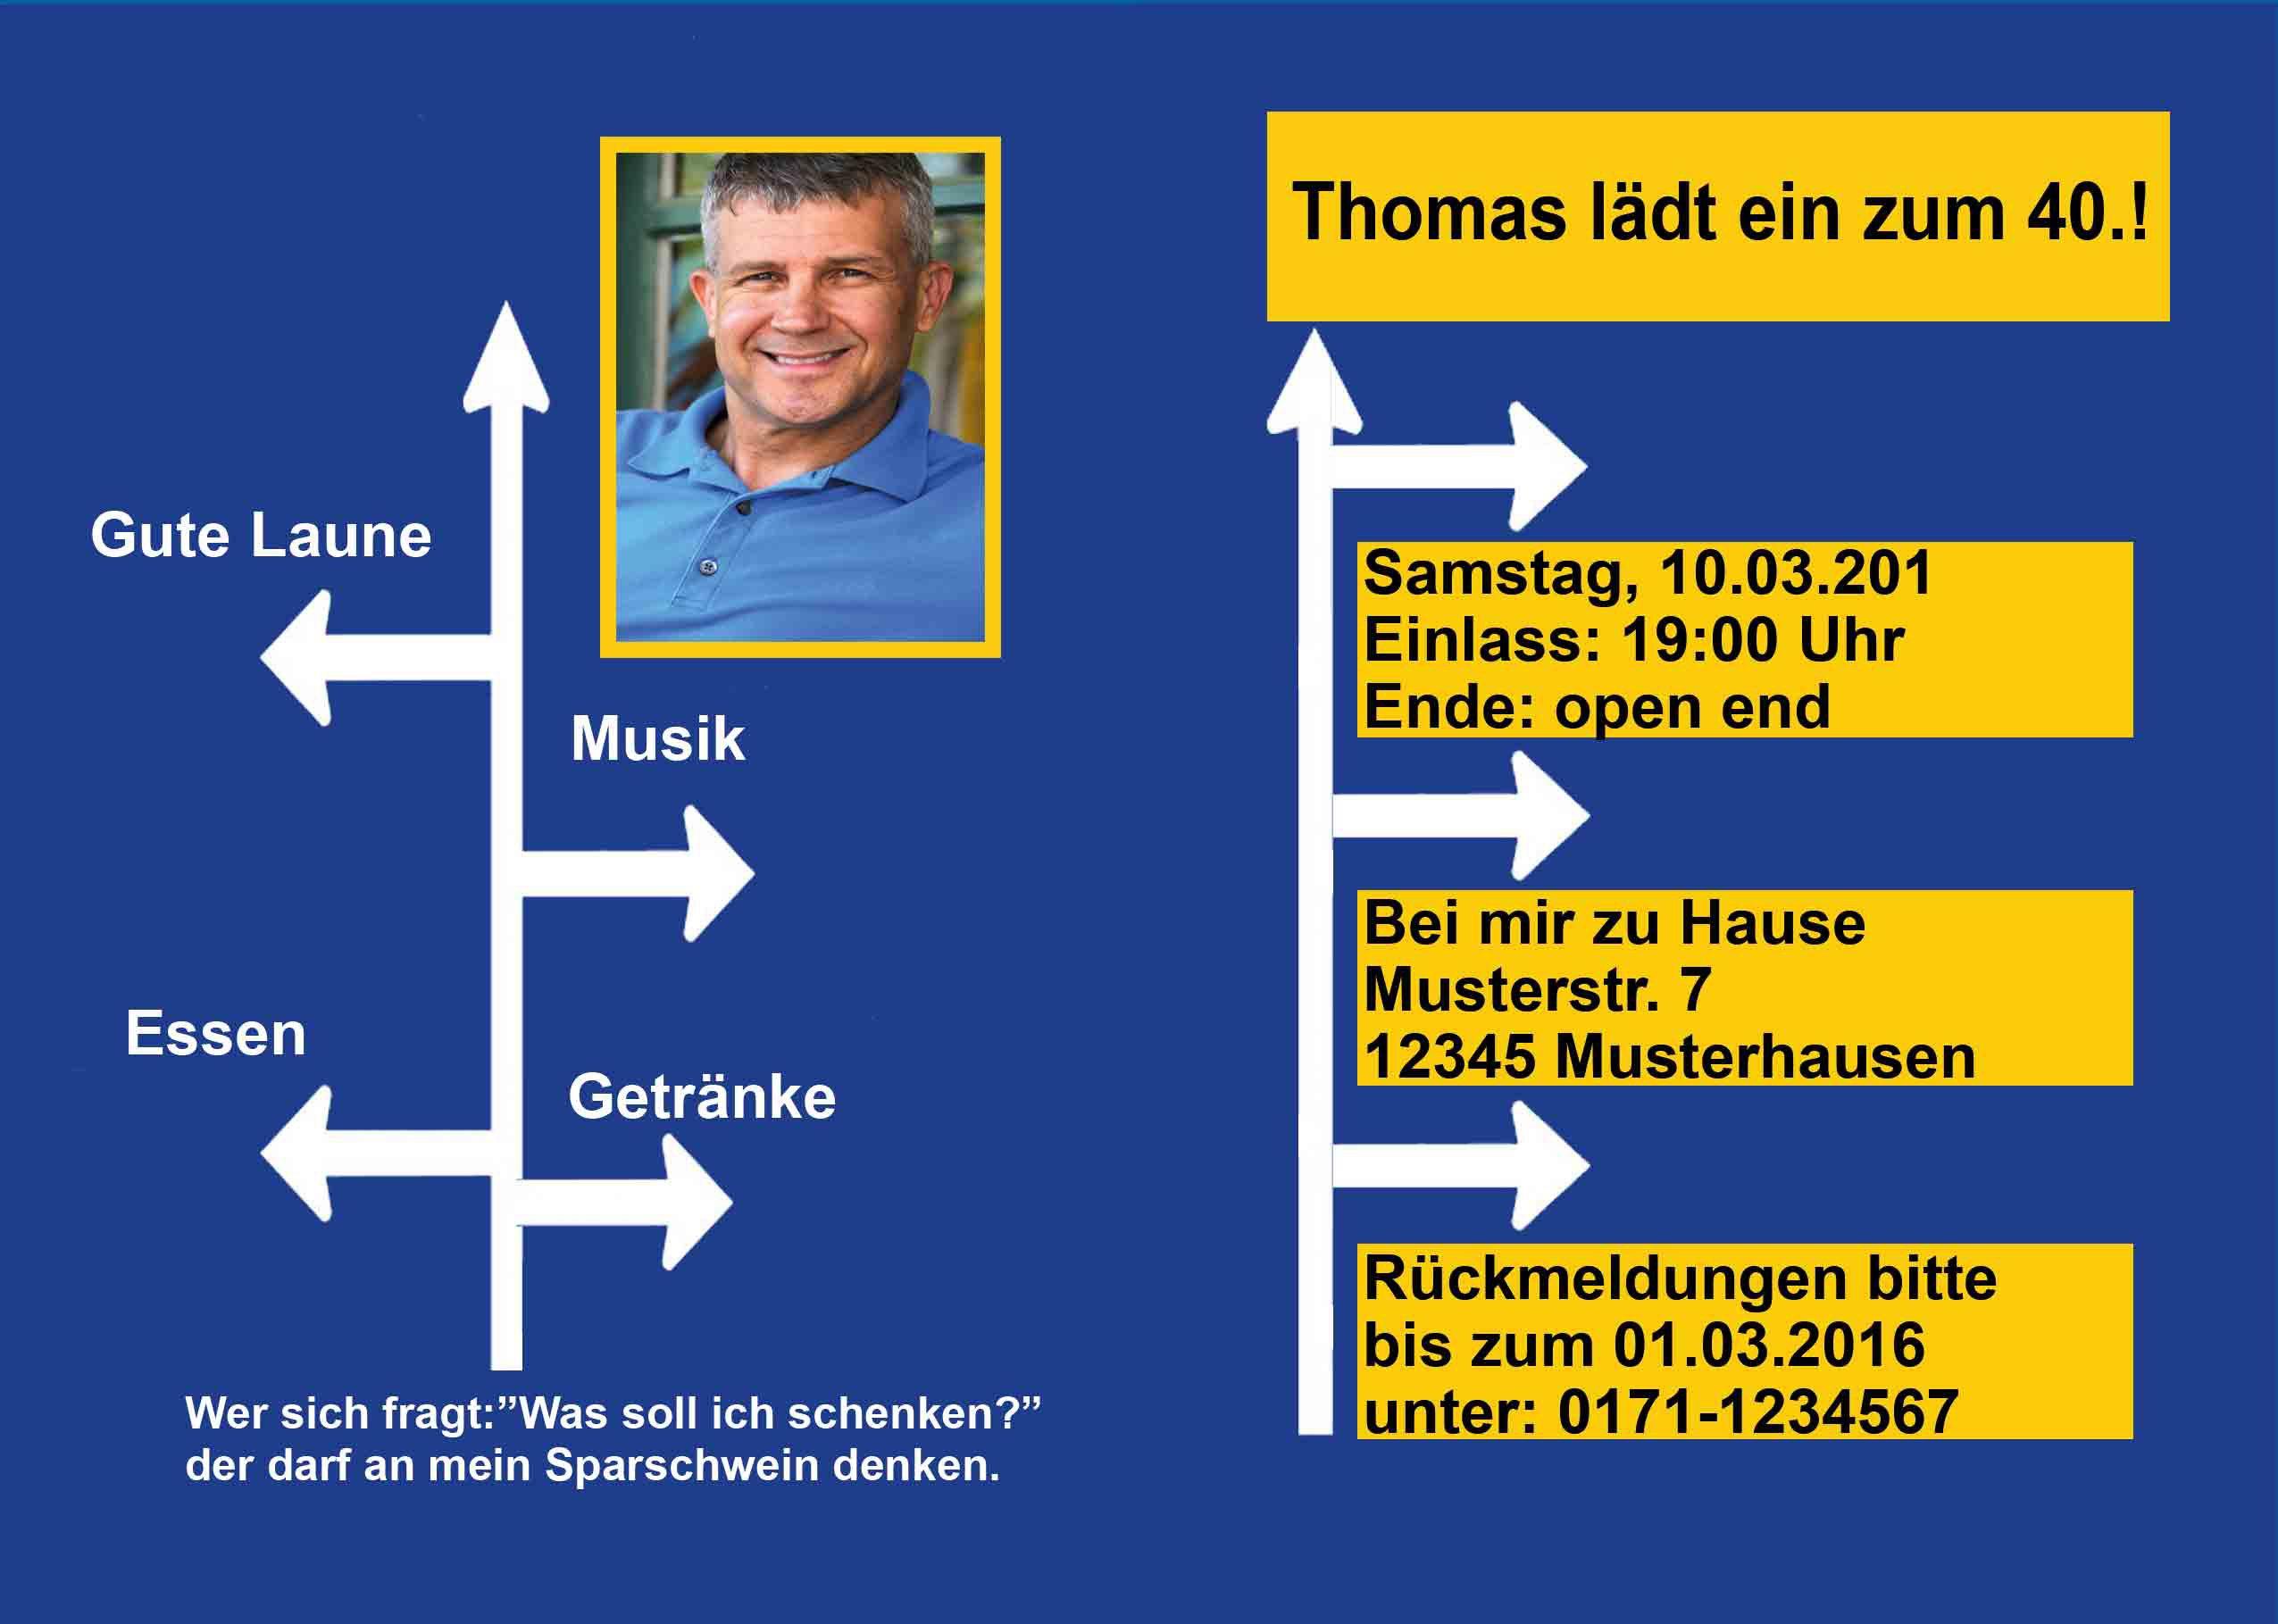 Einladung Zum 60 Geburtstag : Einladung Zum 60. Geburtstag Frau - Geburstag Einladungskarten ...